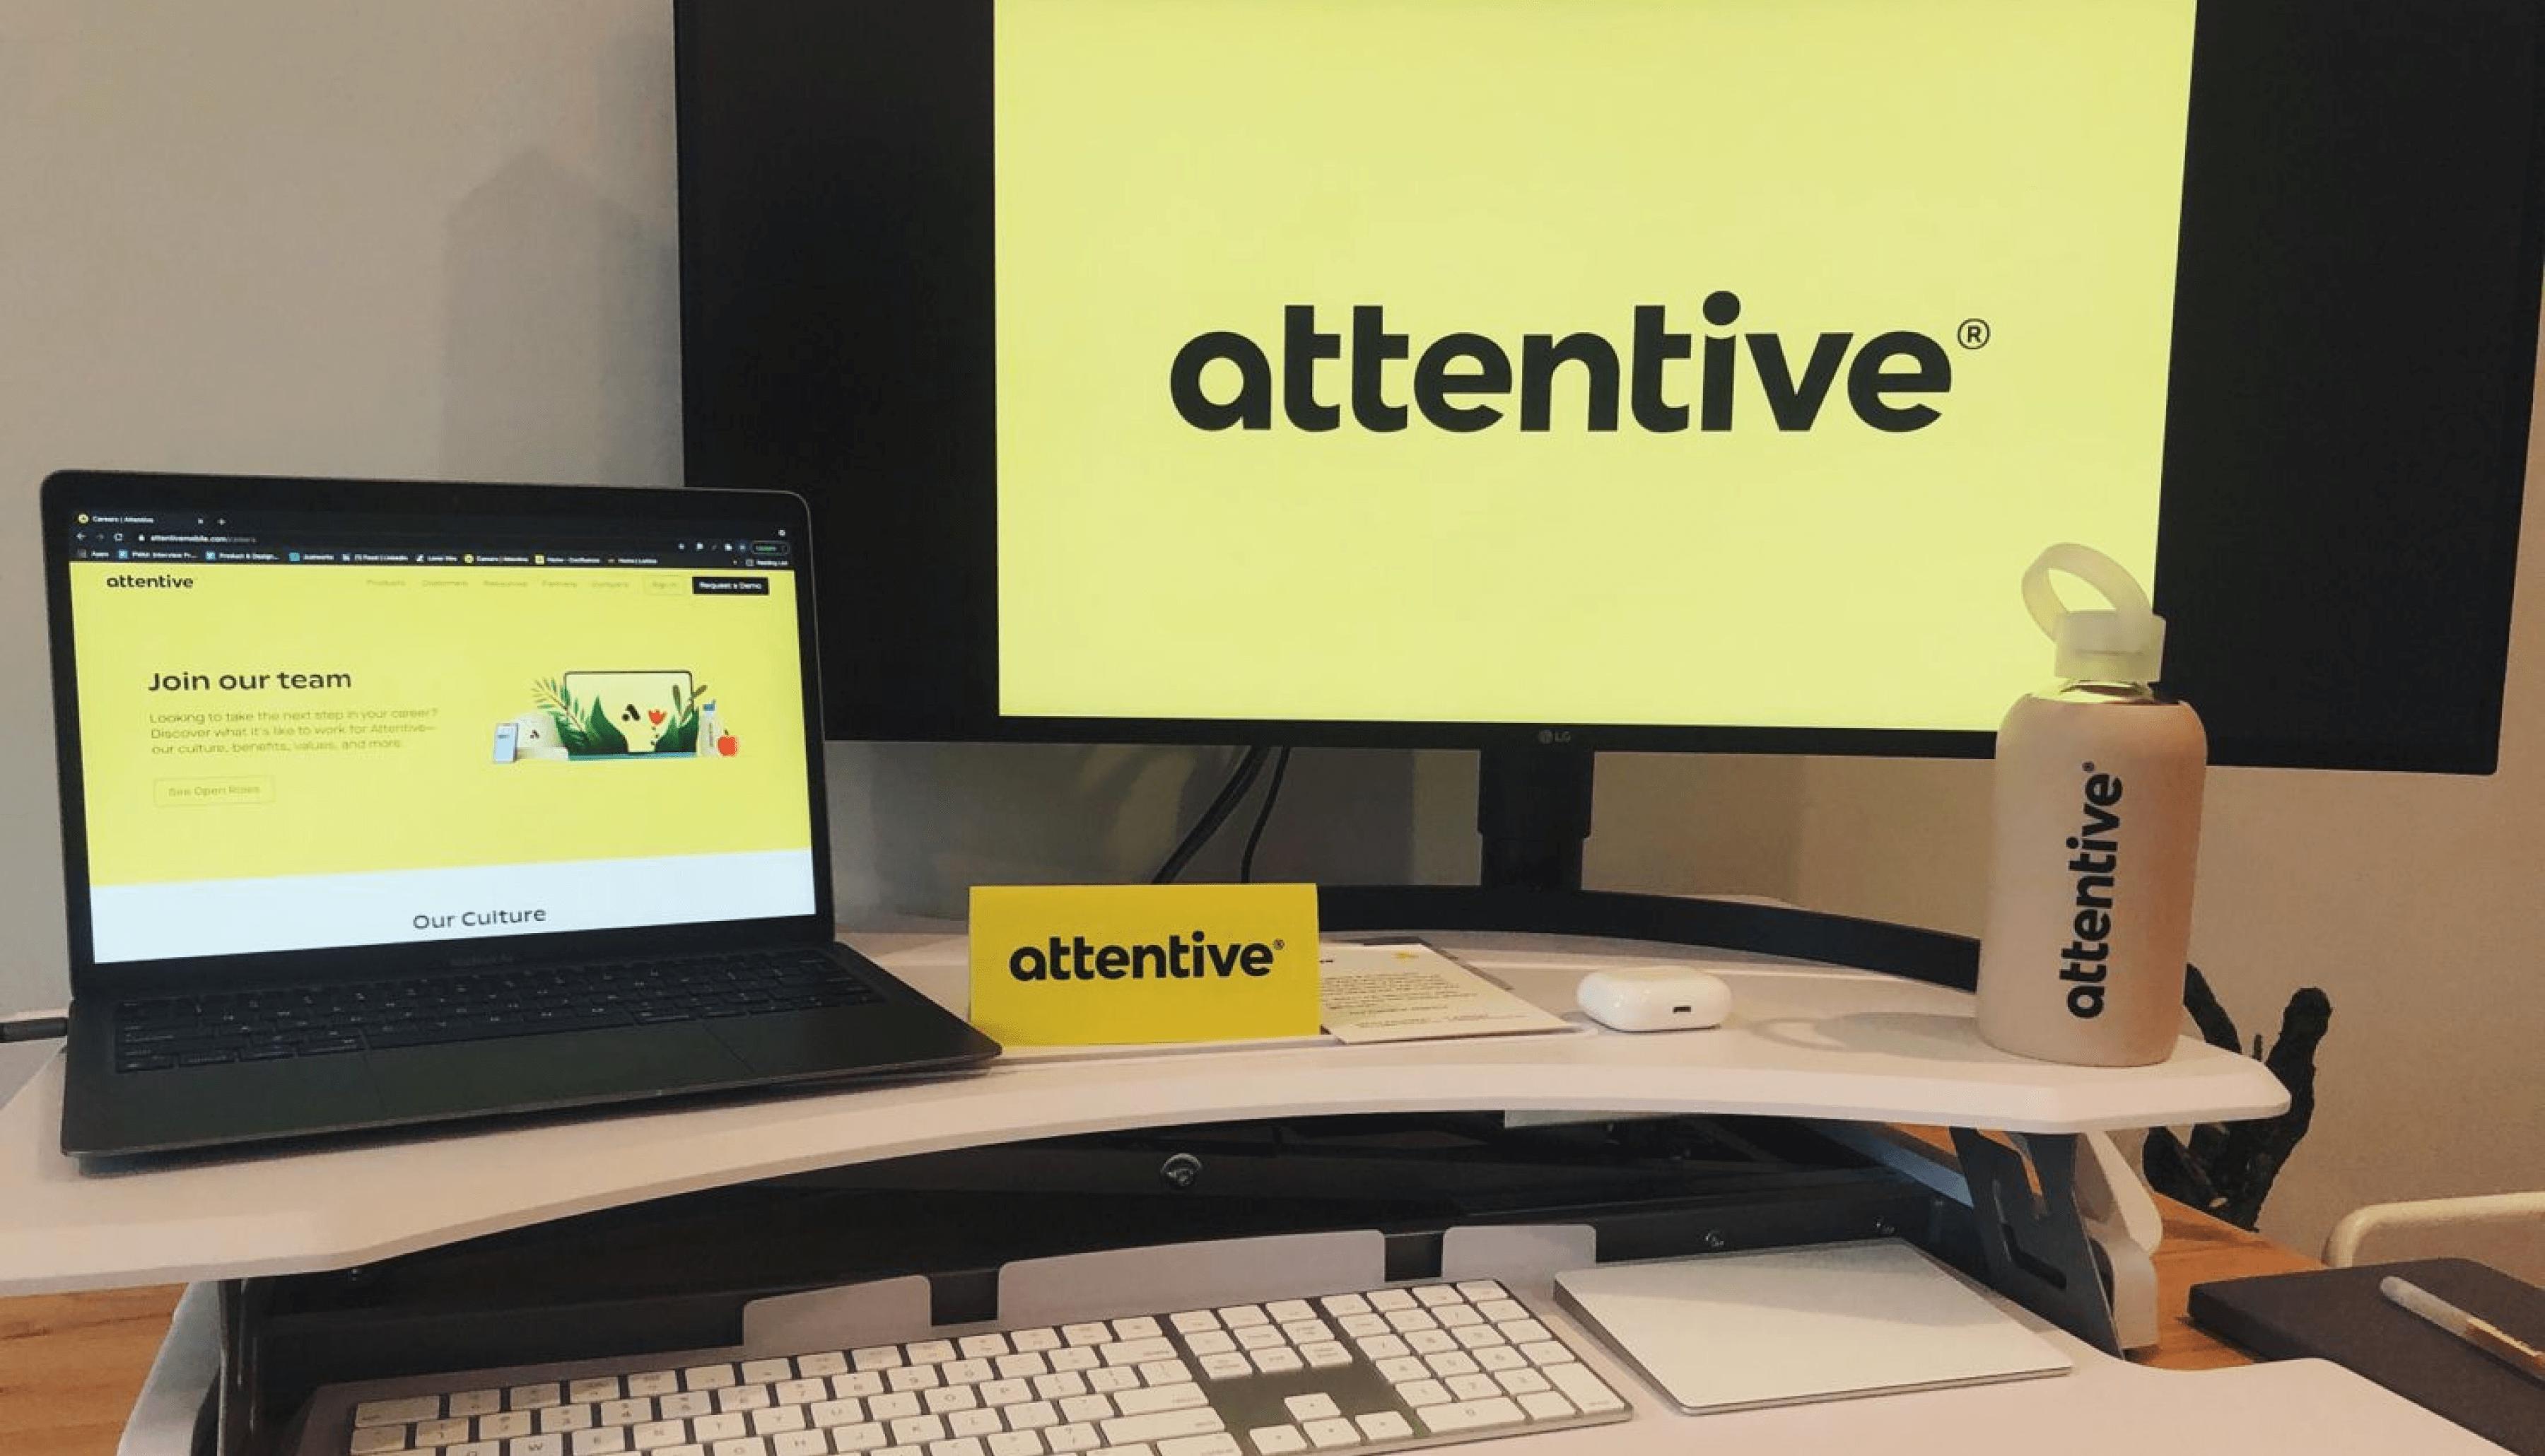 Attentive home office setup